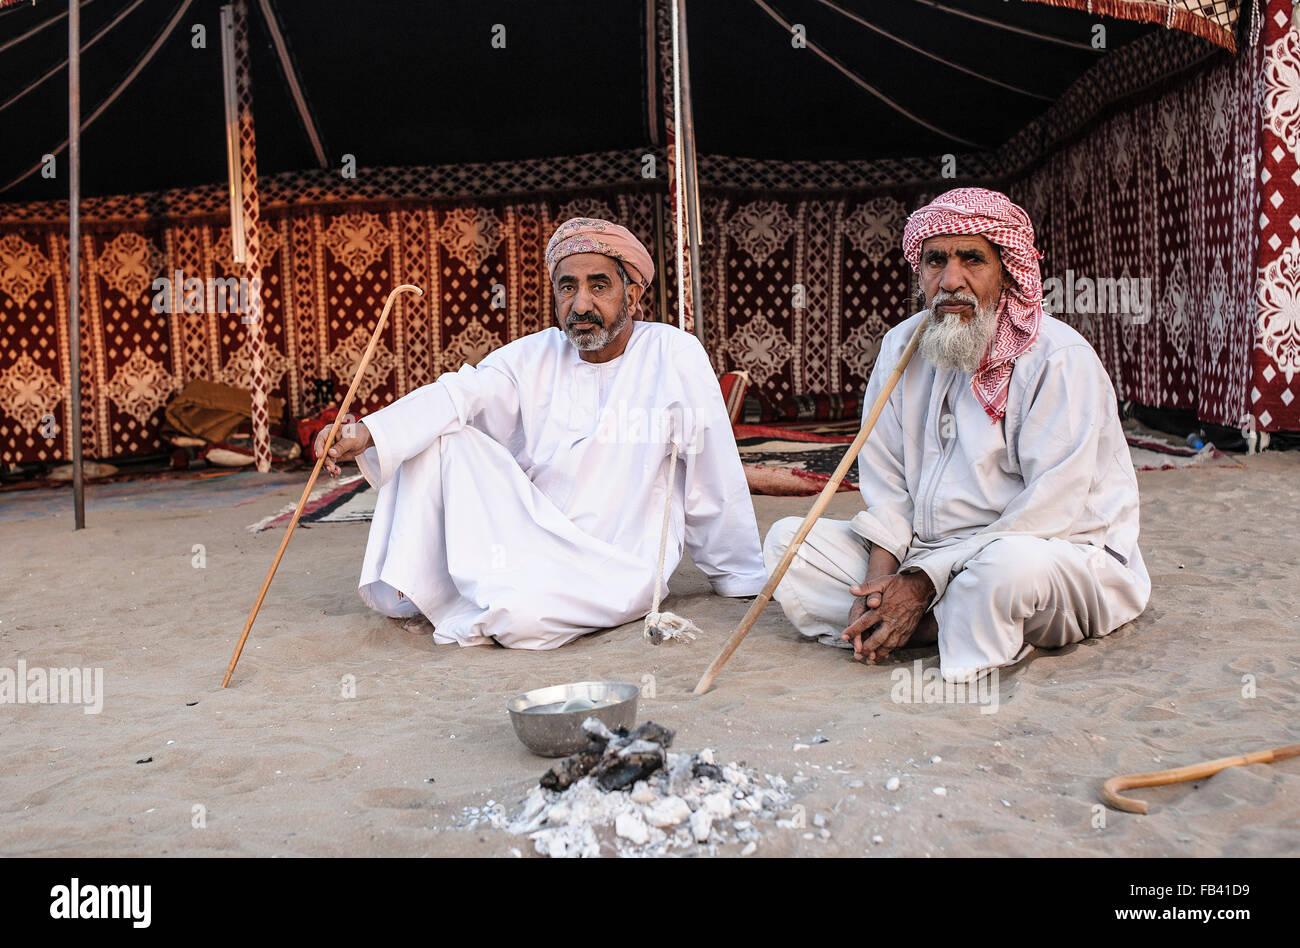 Bedouins of Oman - Stock Image